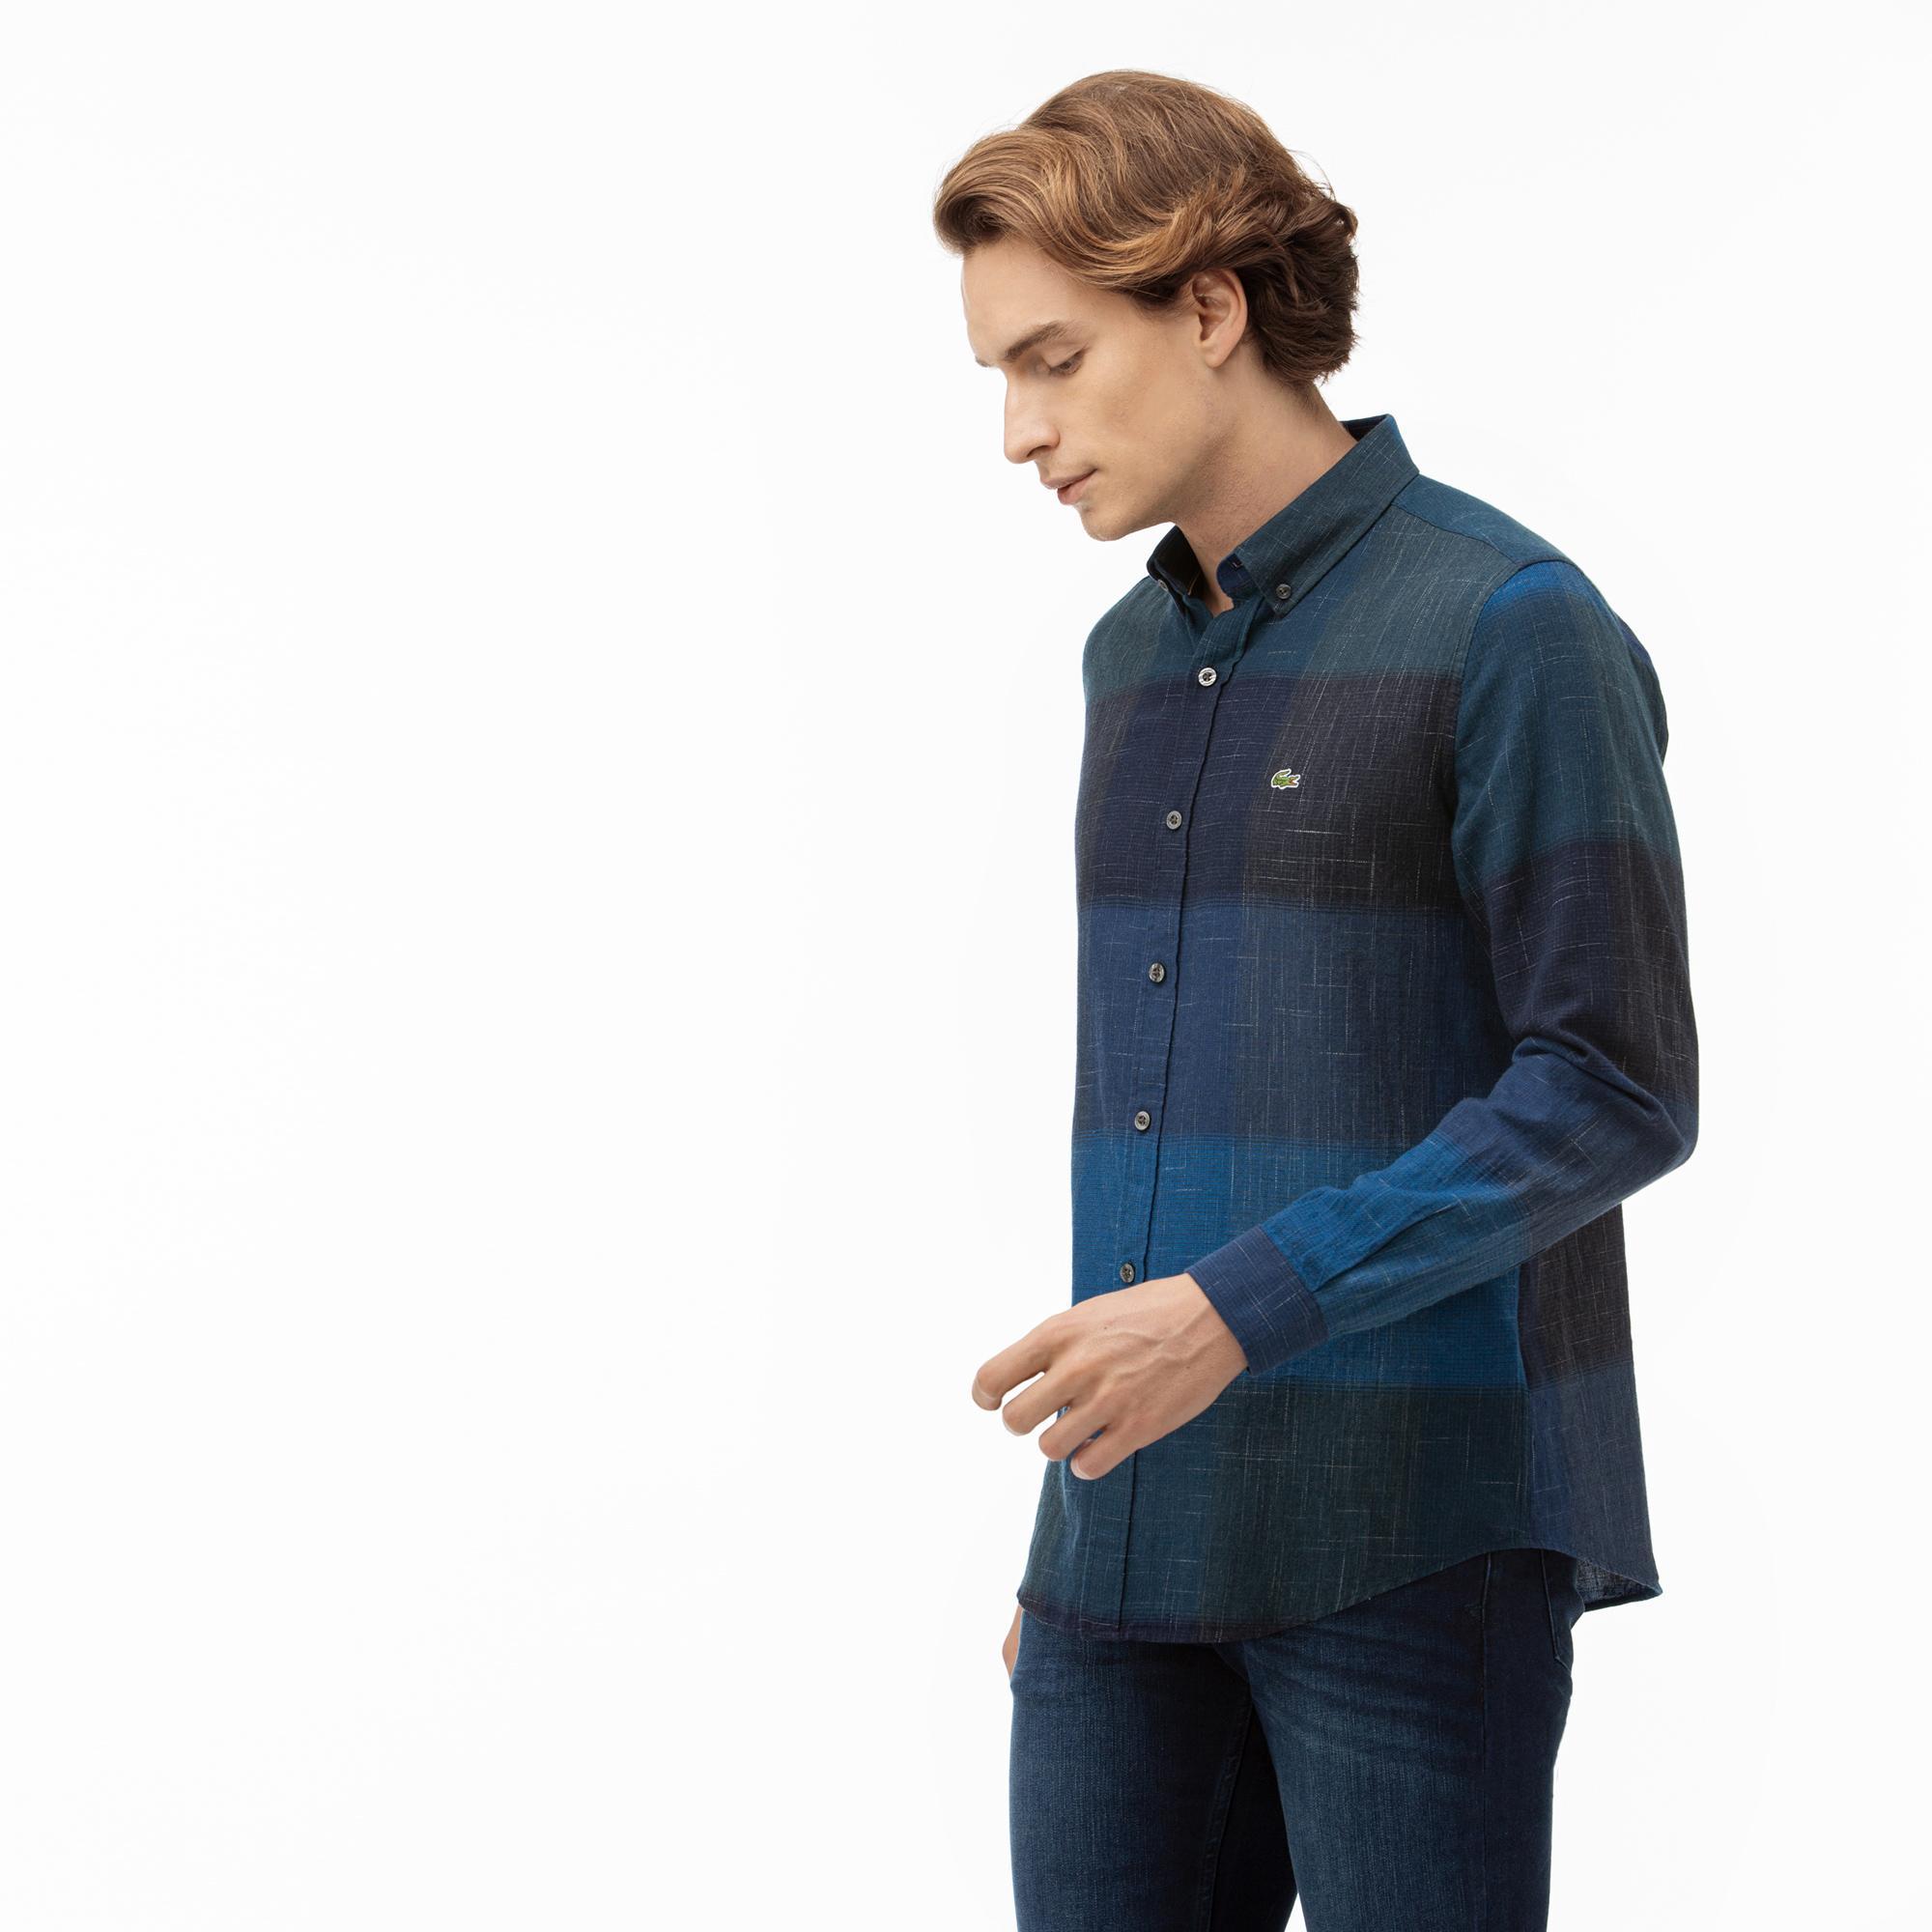 Lacoste Erkek Slim Fit Blok Desenli Lacivert Gömlek